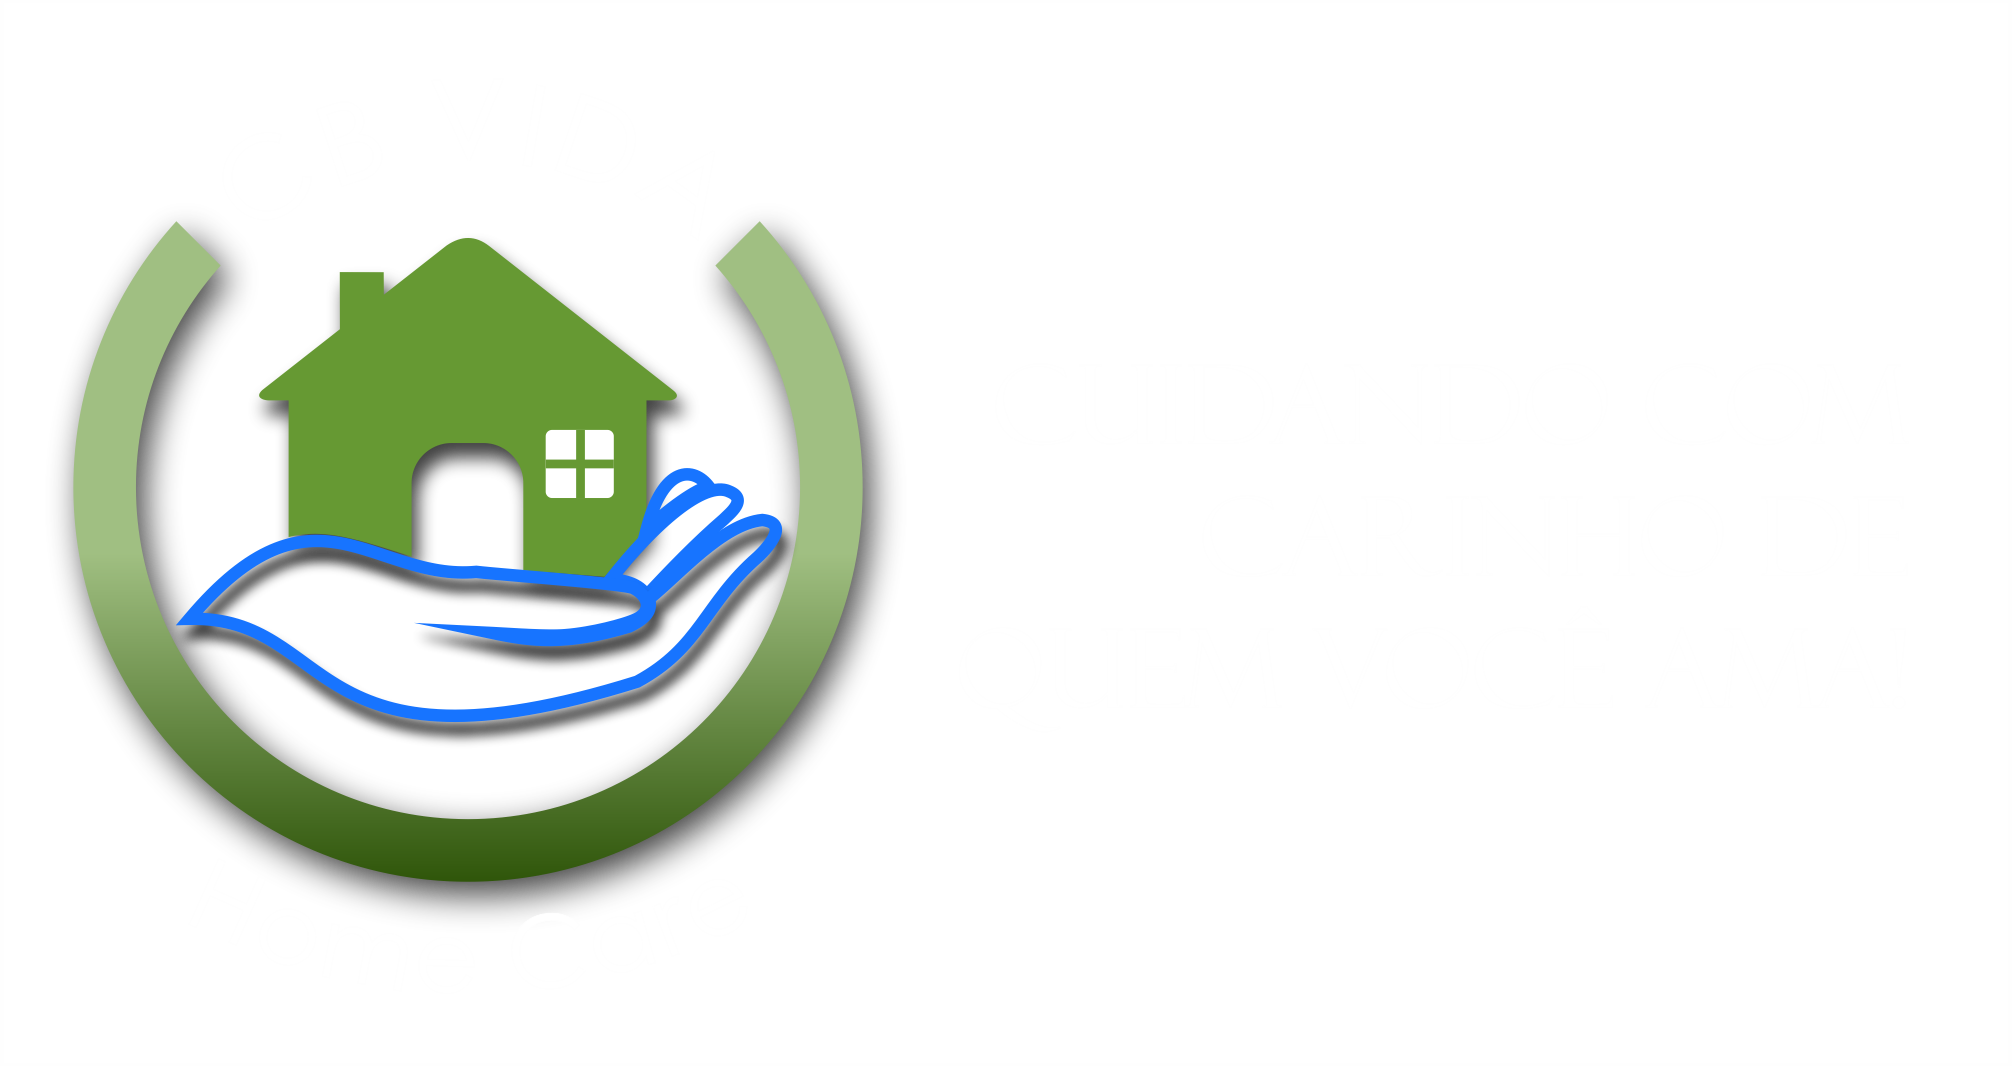 C.B. Vida Home Care